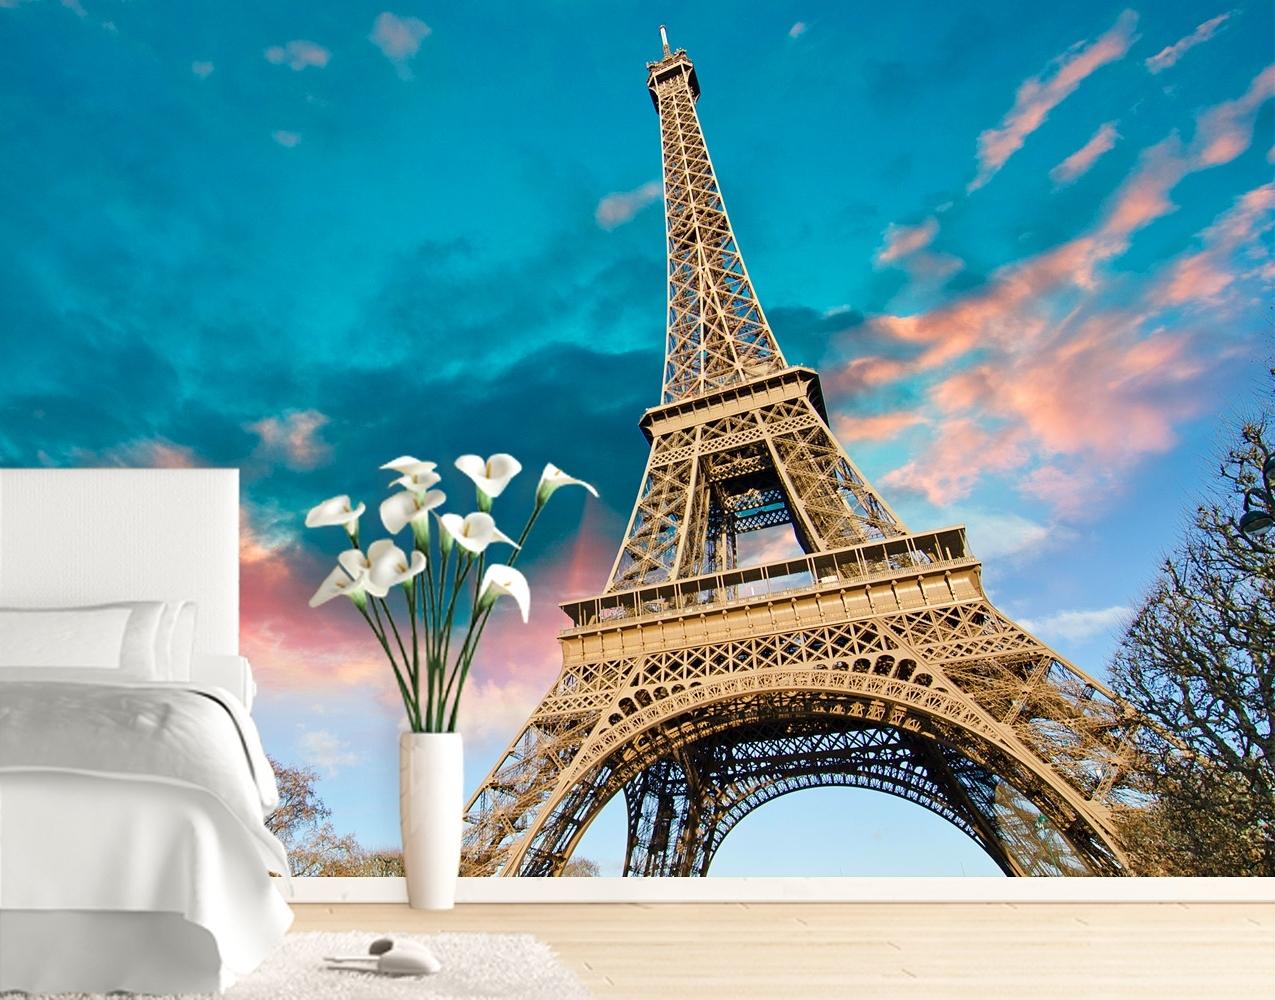 Nz Designer Wall Art Intended For Eiffel Tower Wall Art (View 6 of 15)